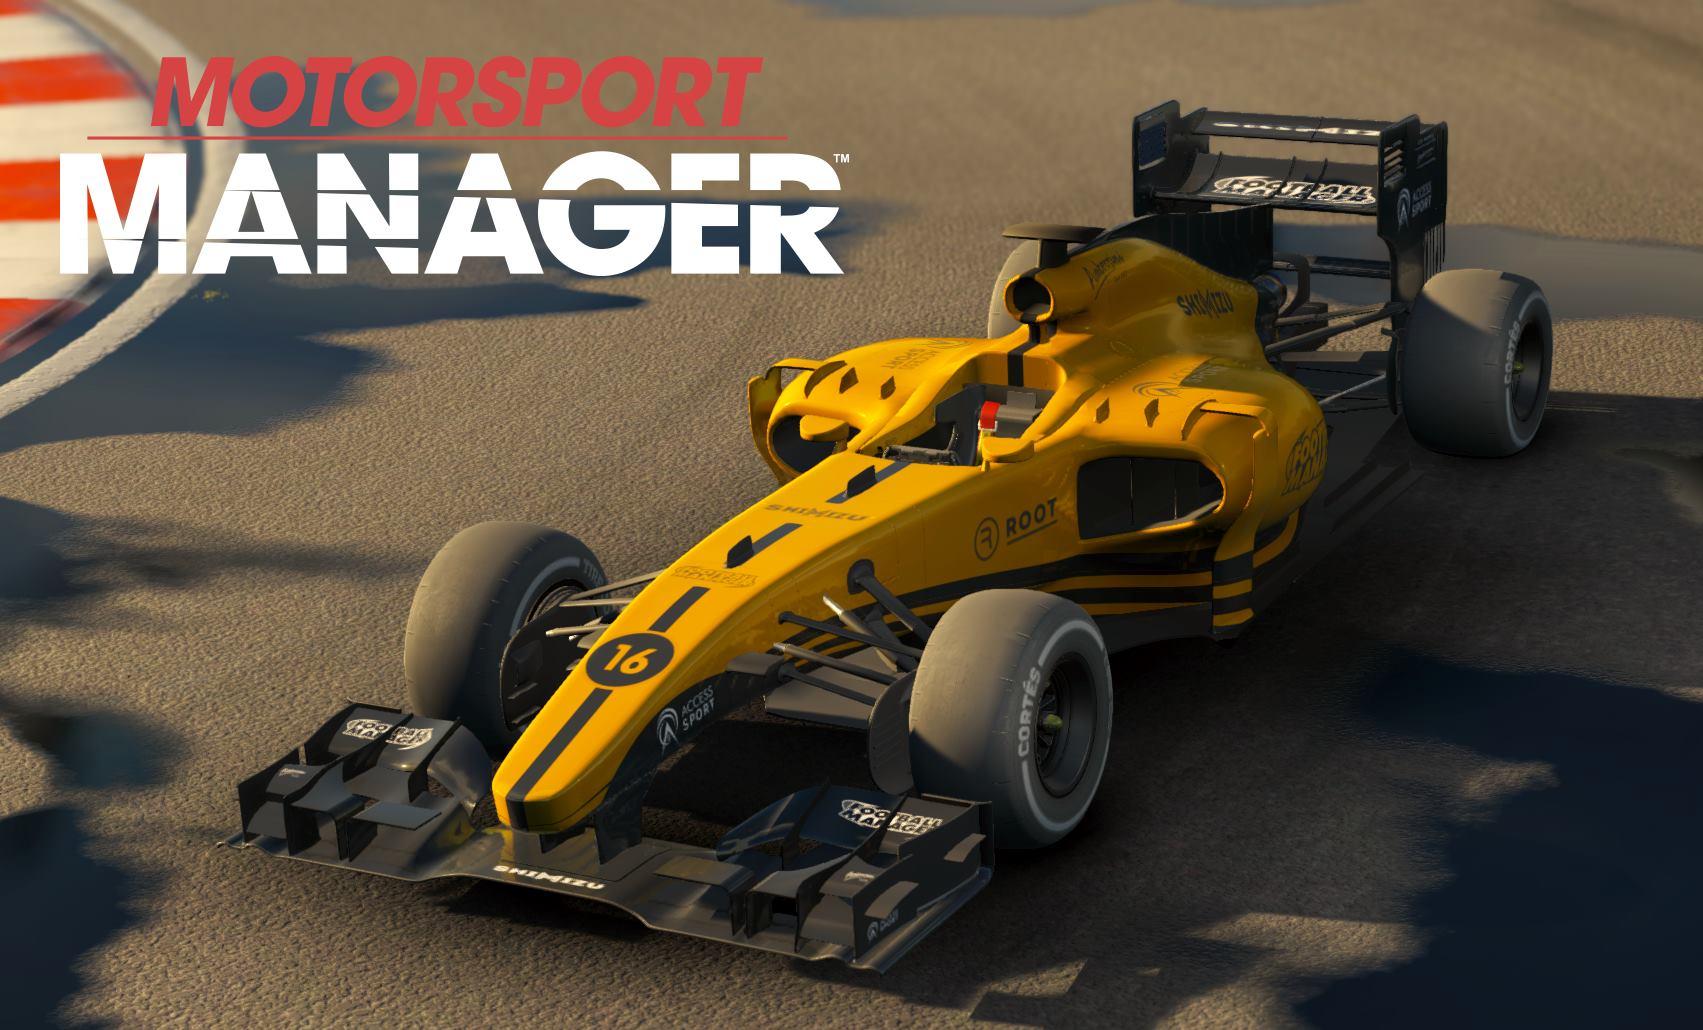 Motorsport Manager Updae Upcoming.jpg